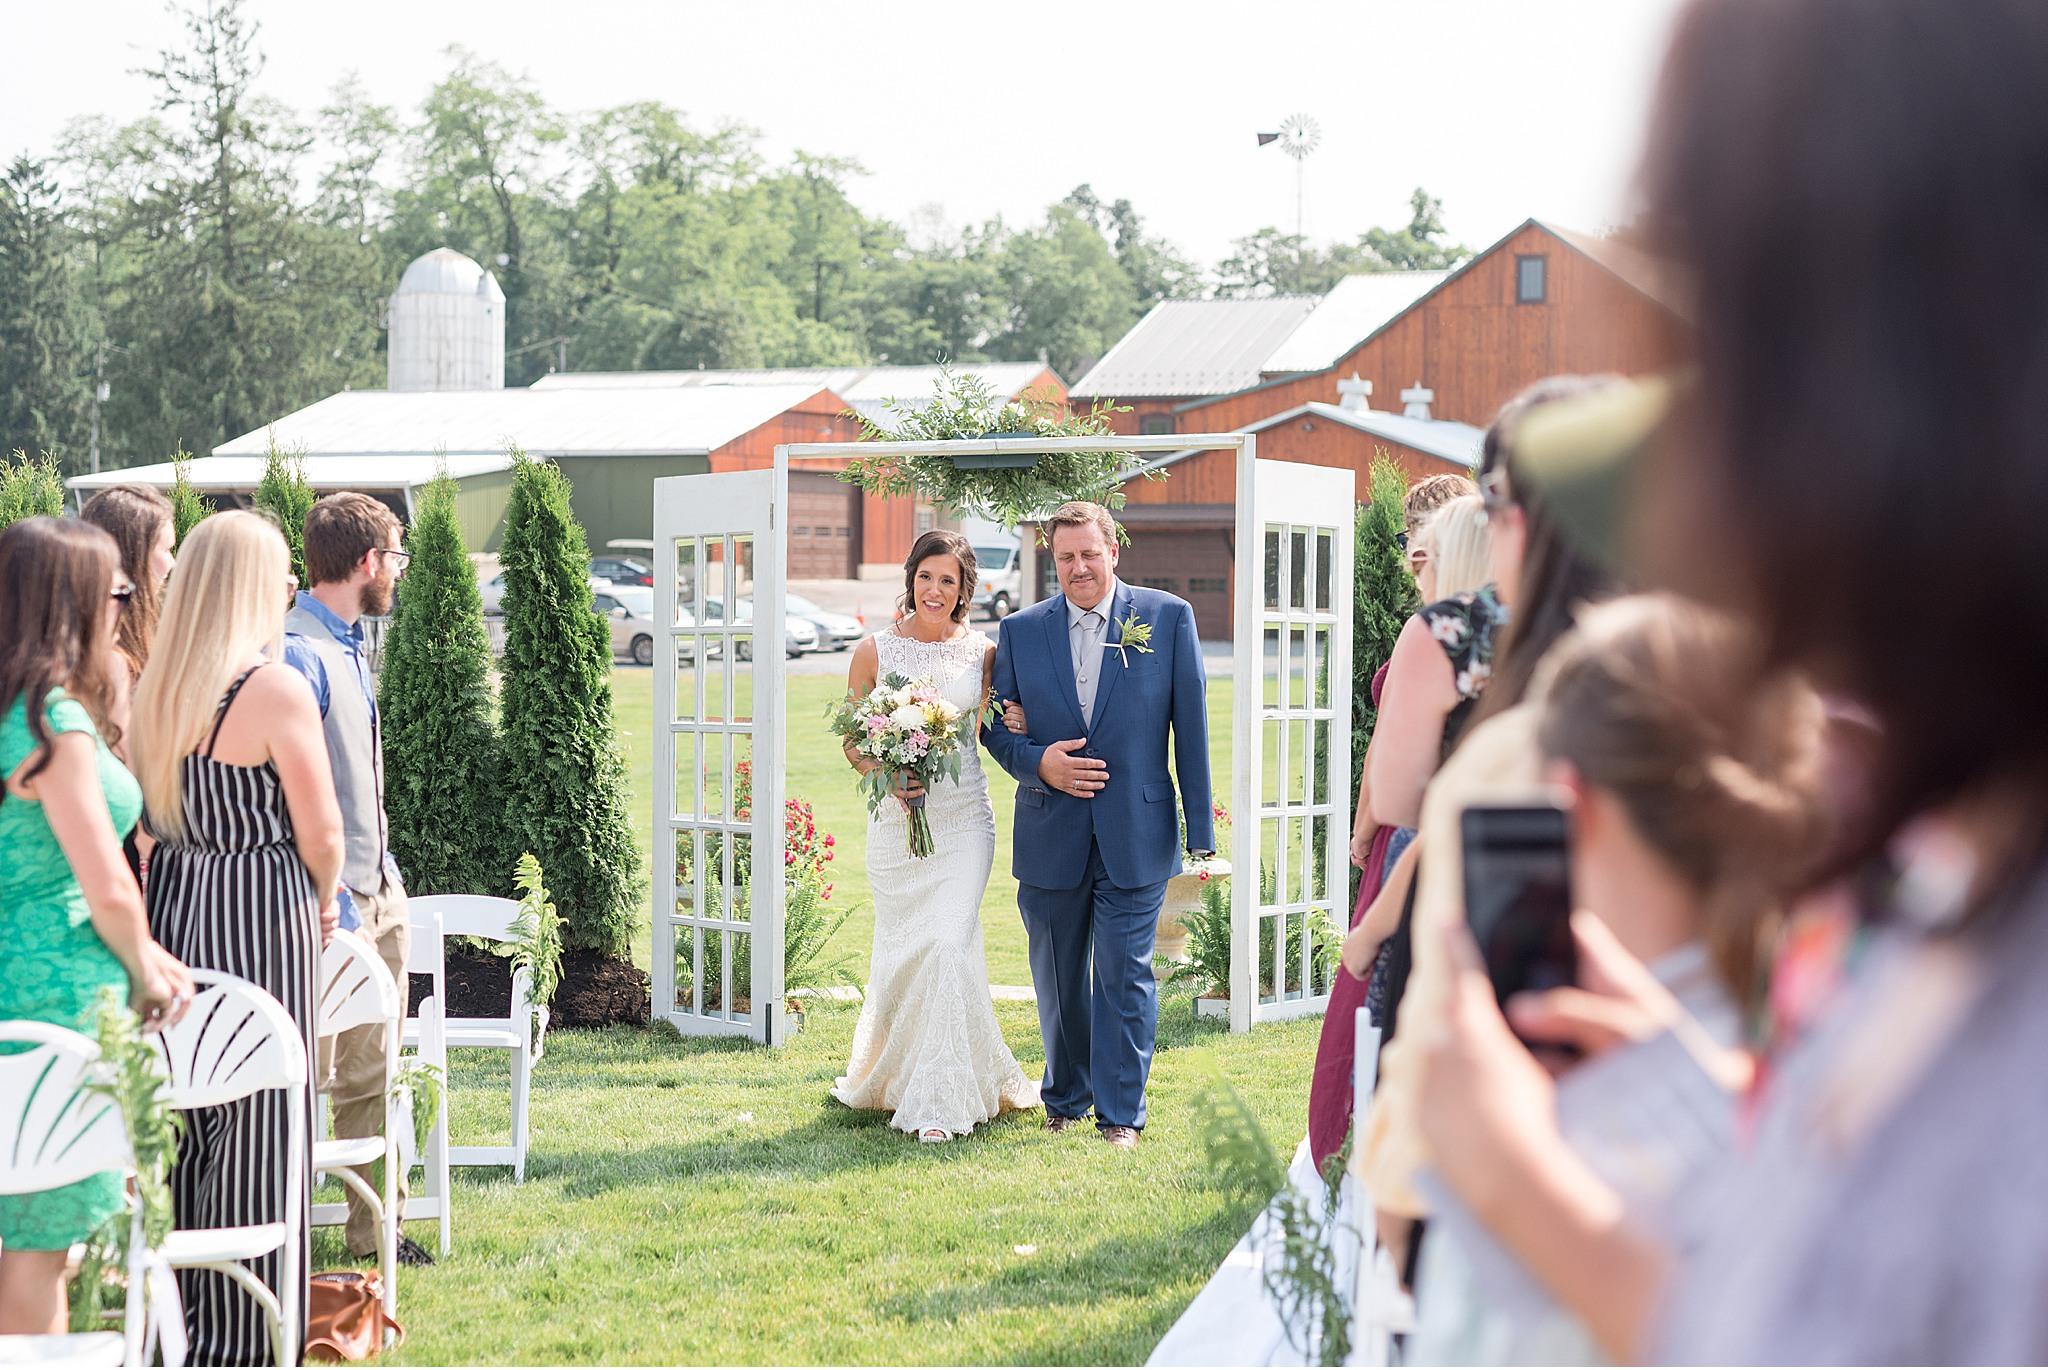 Simmontown wedding Barn Lancaster PA wedding engagement Photography_3616.jpg